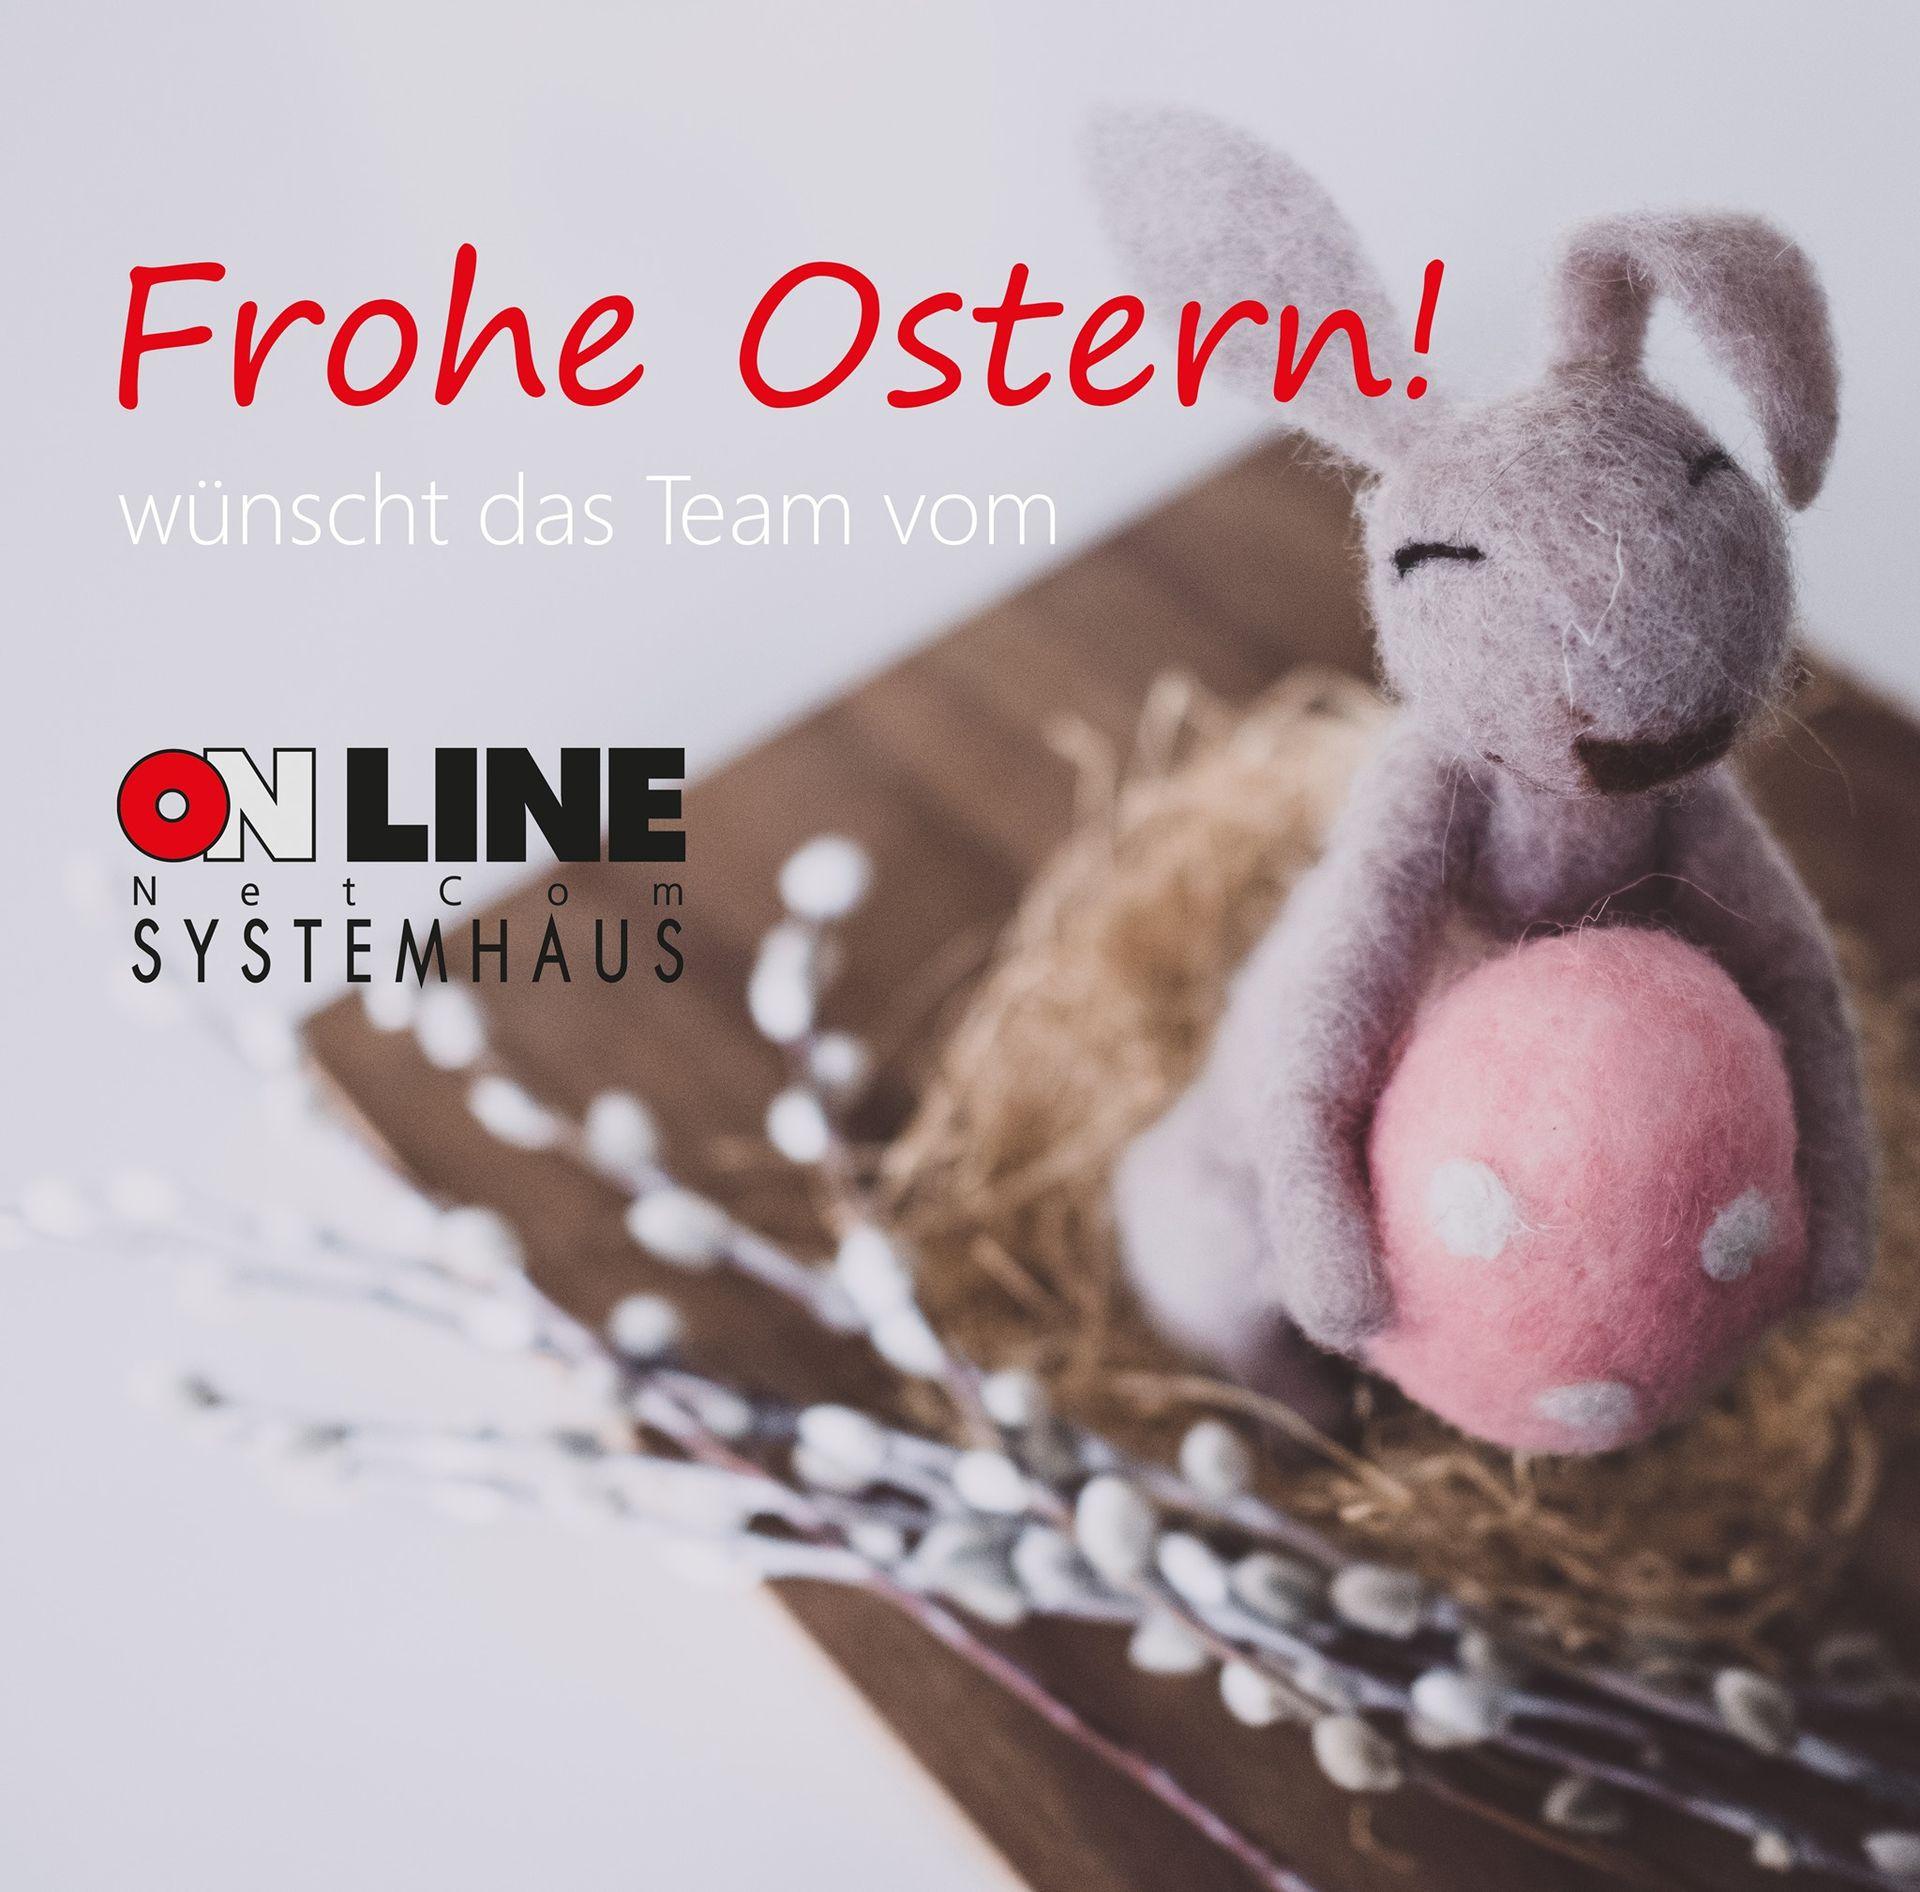 News   Online NetCom Systemhaus GmbH